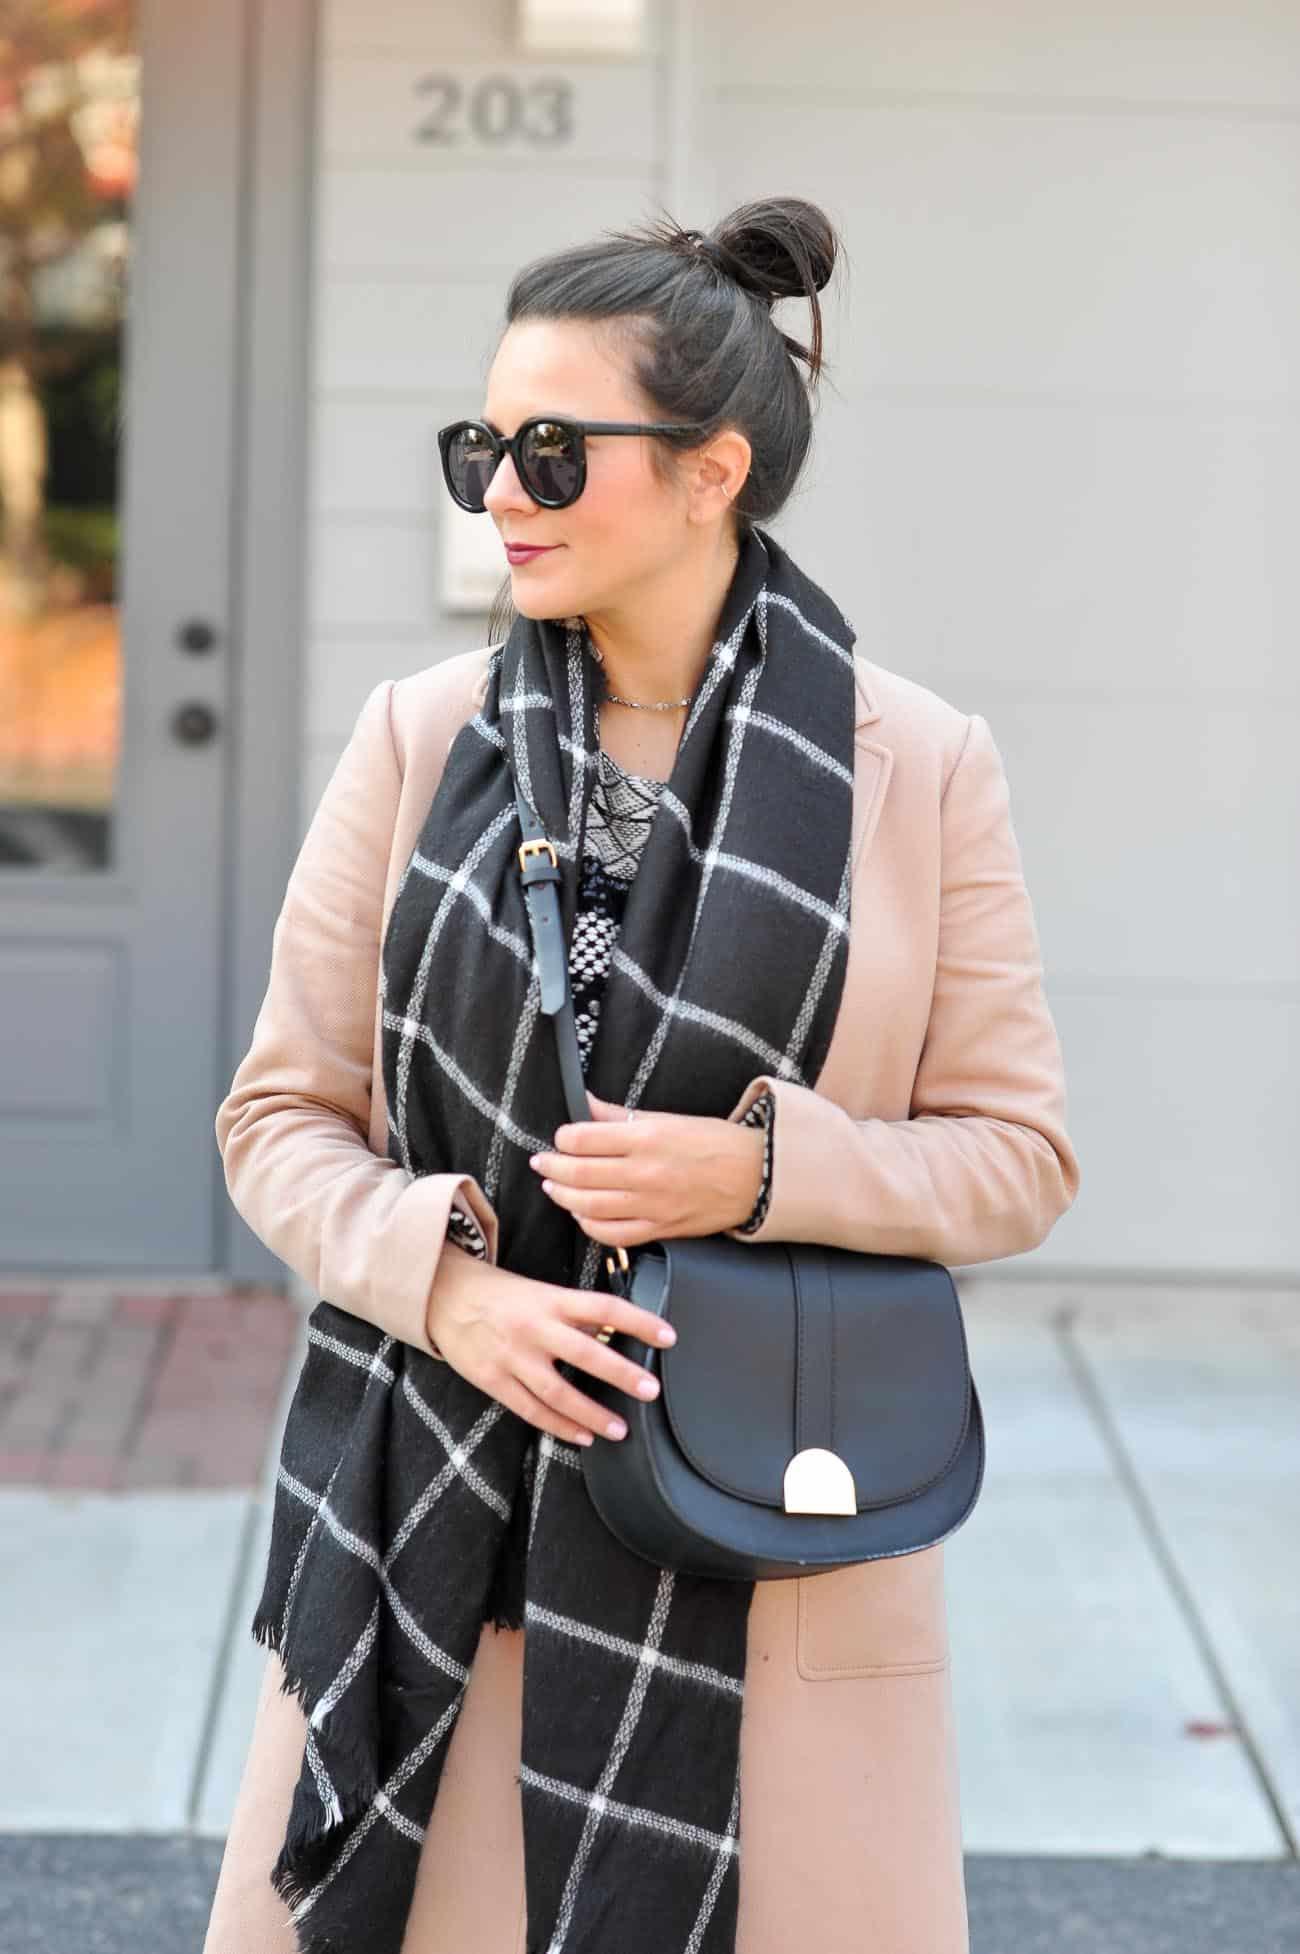 layered winter outfit ideas, ann taylor camel coat, blanket scarf - My Style Vita @mystylevita